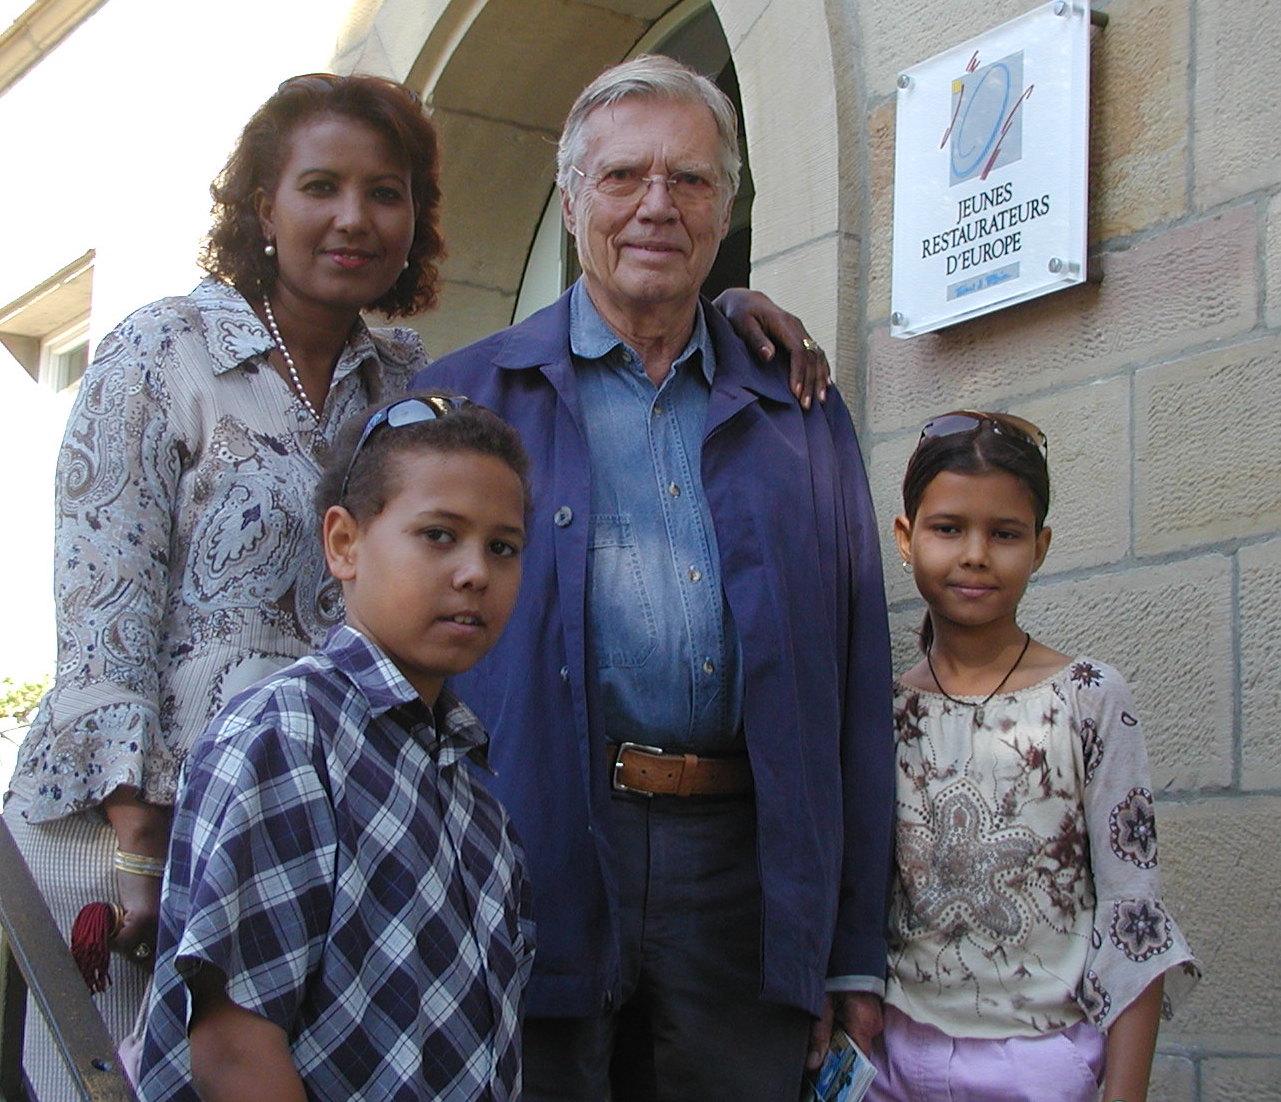 Almas und Karlheinz Böhm mit Kindern Nikolas und Aida @ rolf diba